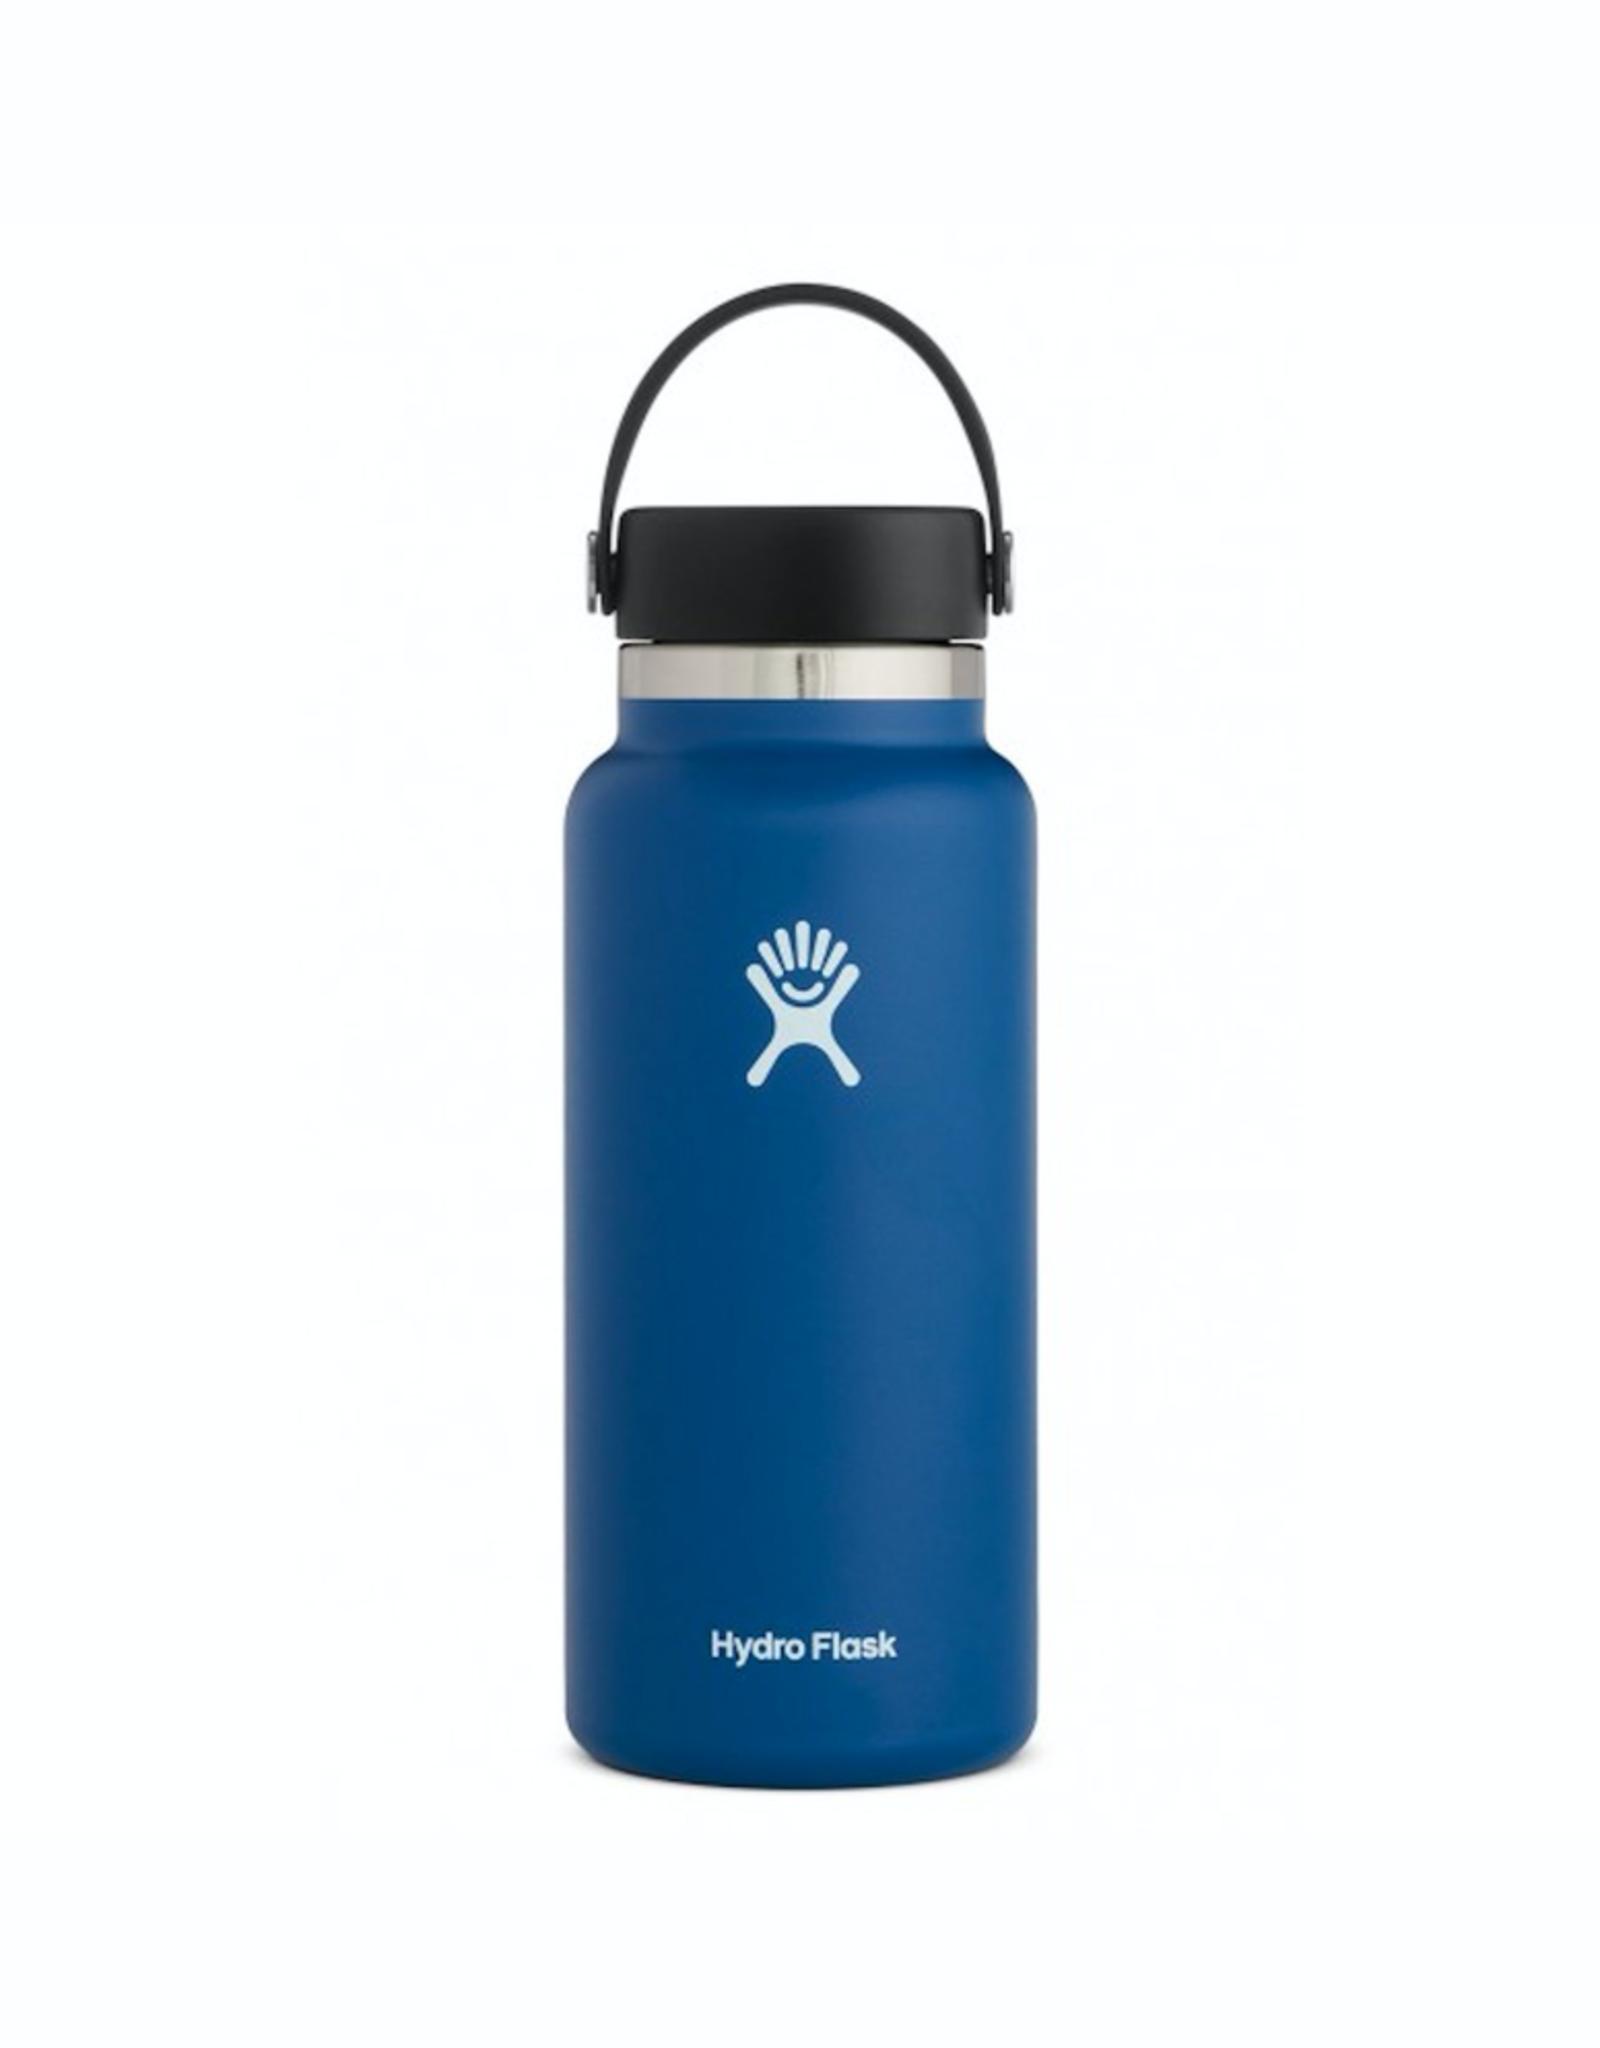 Hydro Flask 32 oz Wide Mouth Flex Cap Bottle in Cobalt